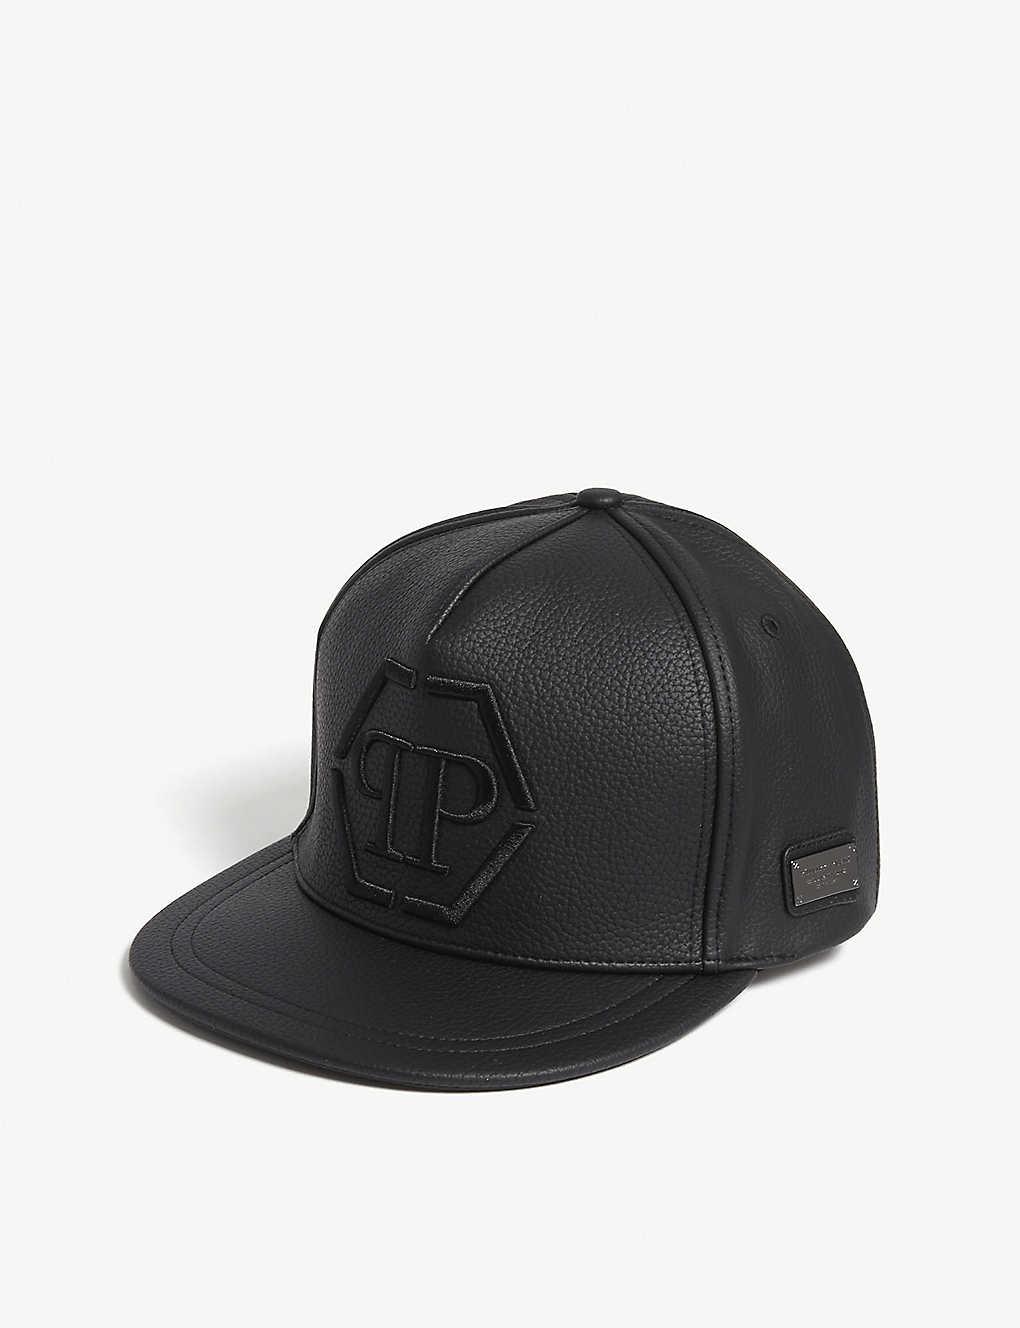 7c50a0d275c8 PHILIPP PLEIN - Tony logo faux-leather strapback cap